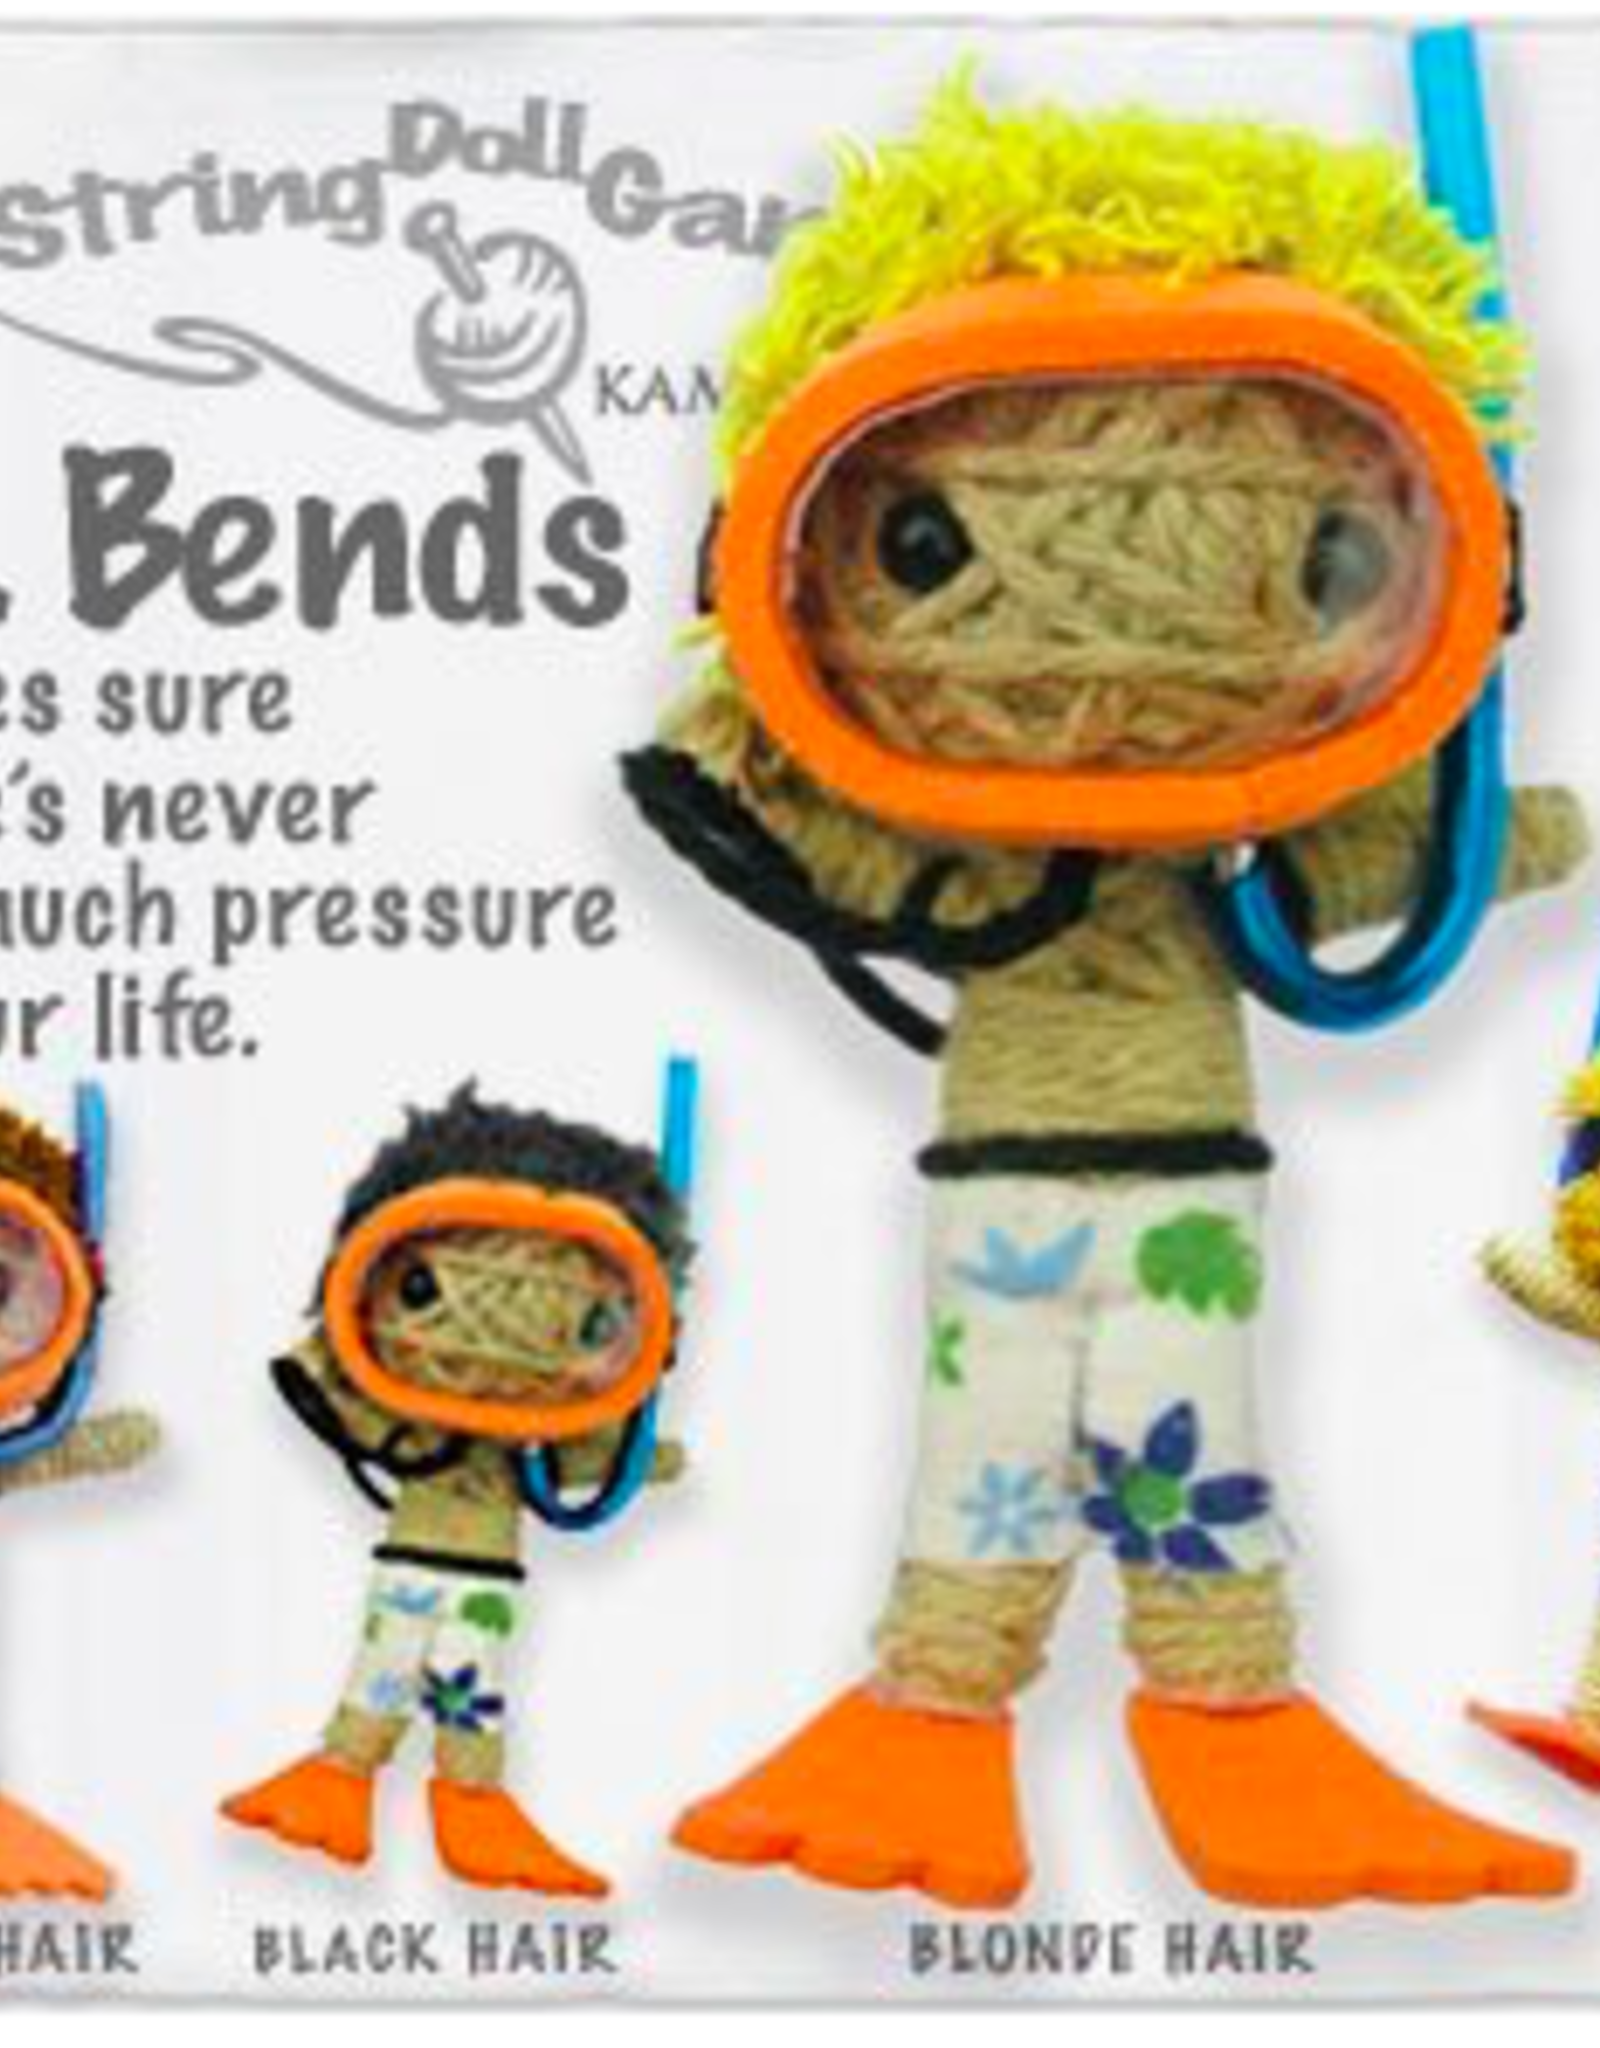 Stringdoll Mr. Bends